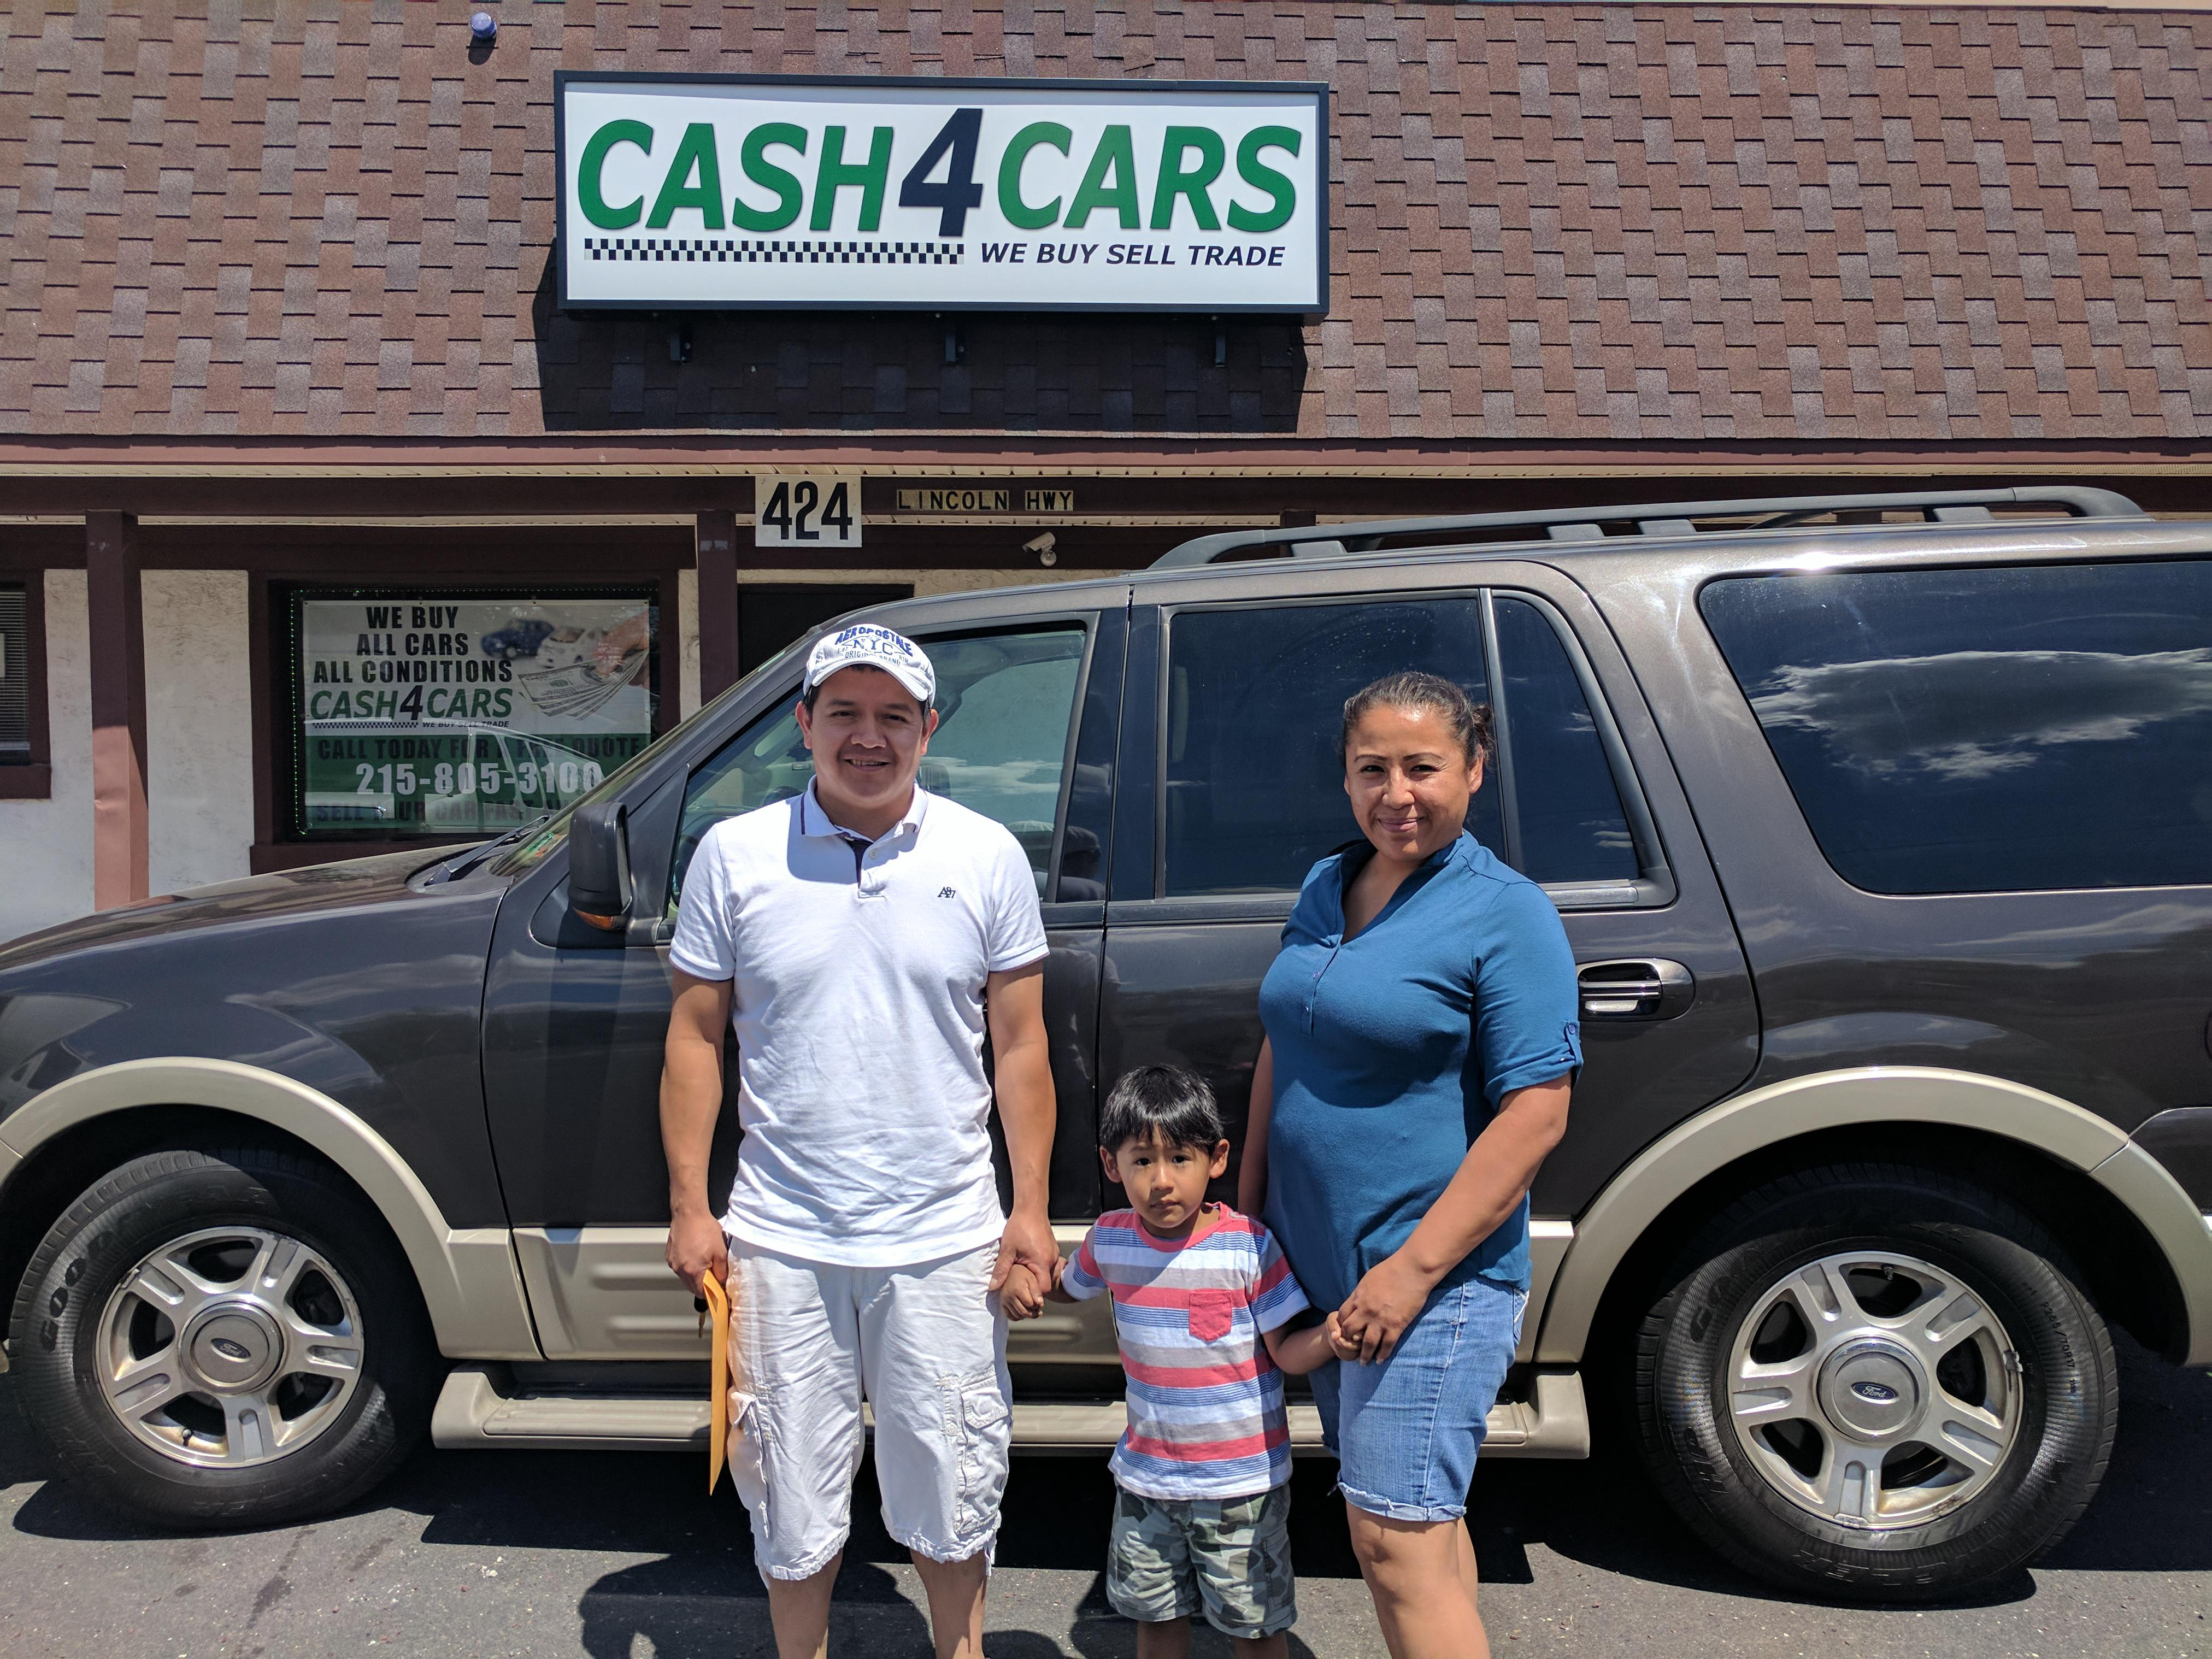 Cash 4 Cars image 2